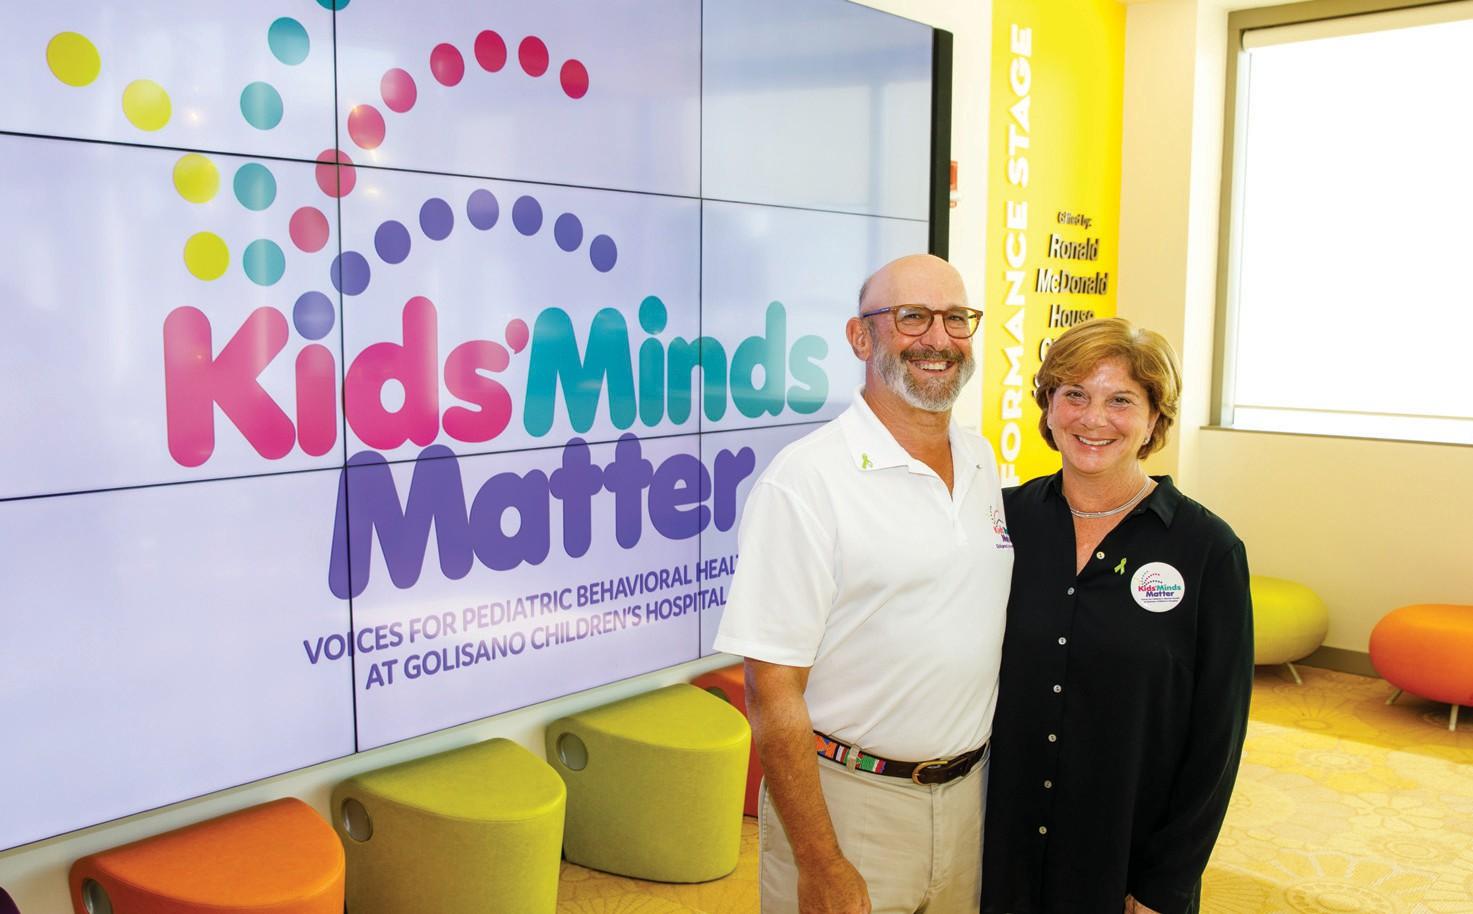 Kids Minds Matter Use Your Voice For Children S Mental Behavioral